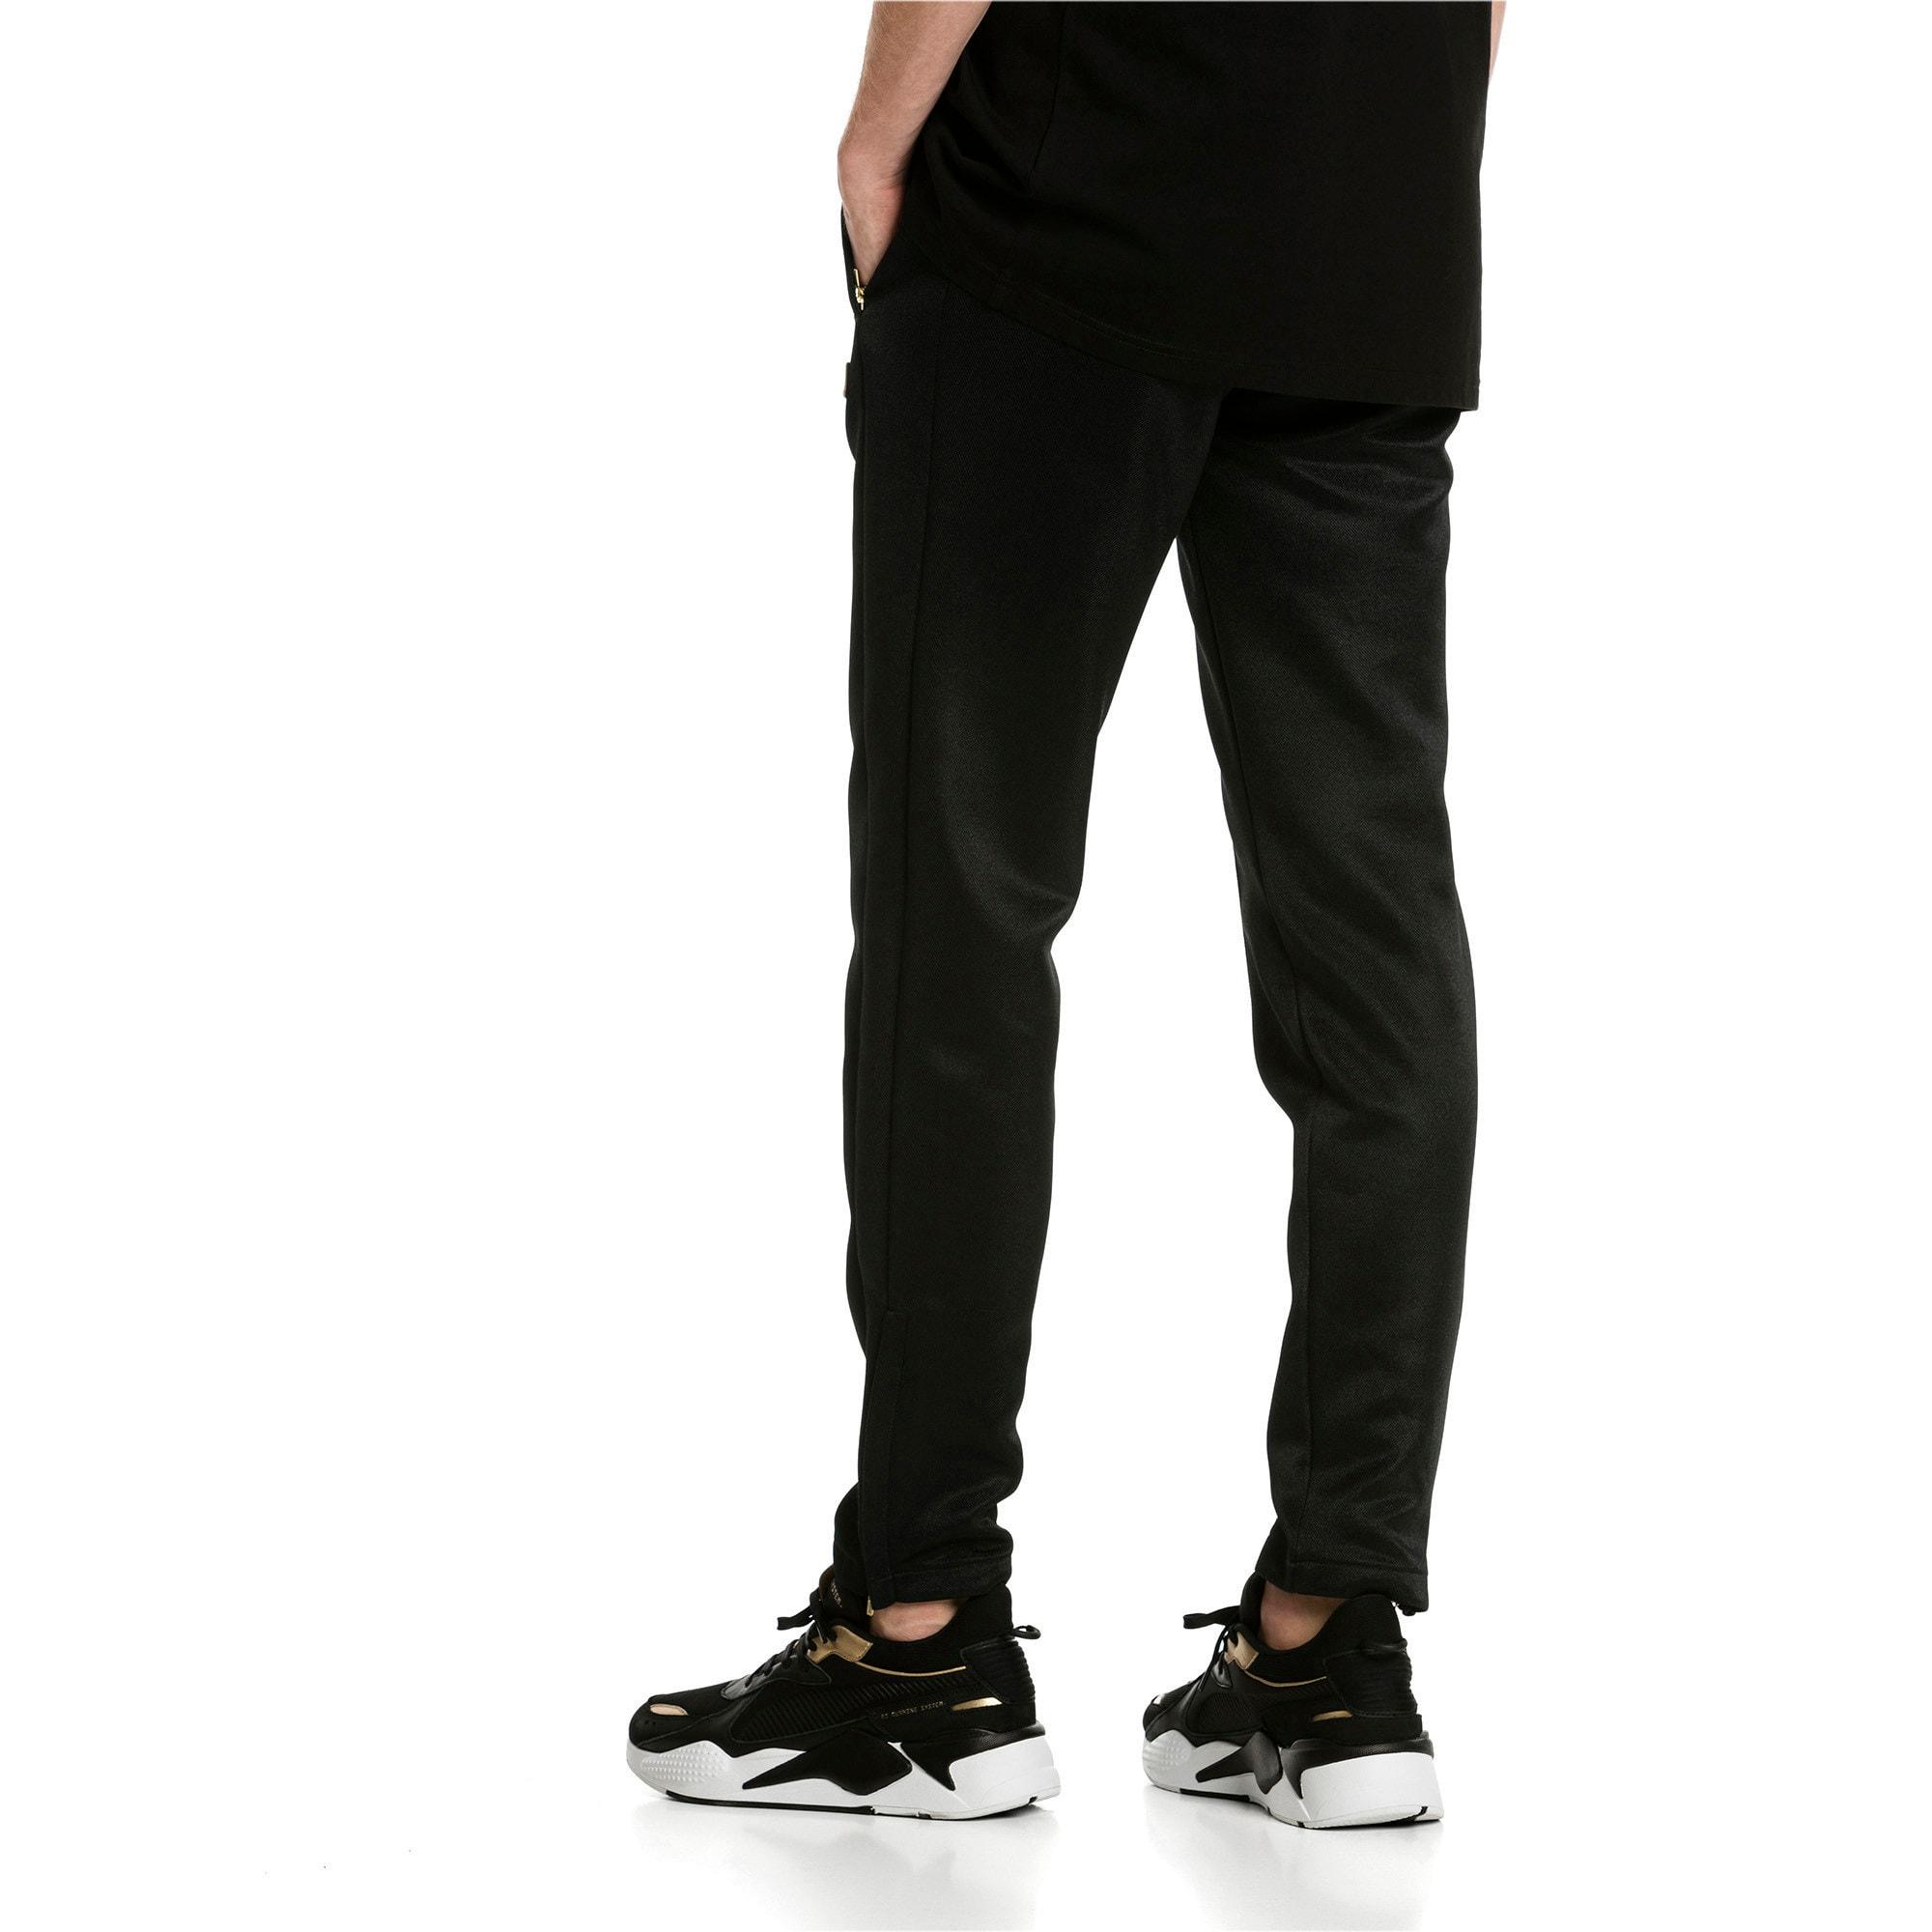 Thumbnail 2 of T7 Spezial Trophy Track Pants, Puma Black, medium-IND